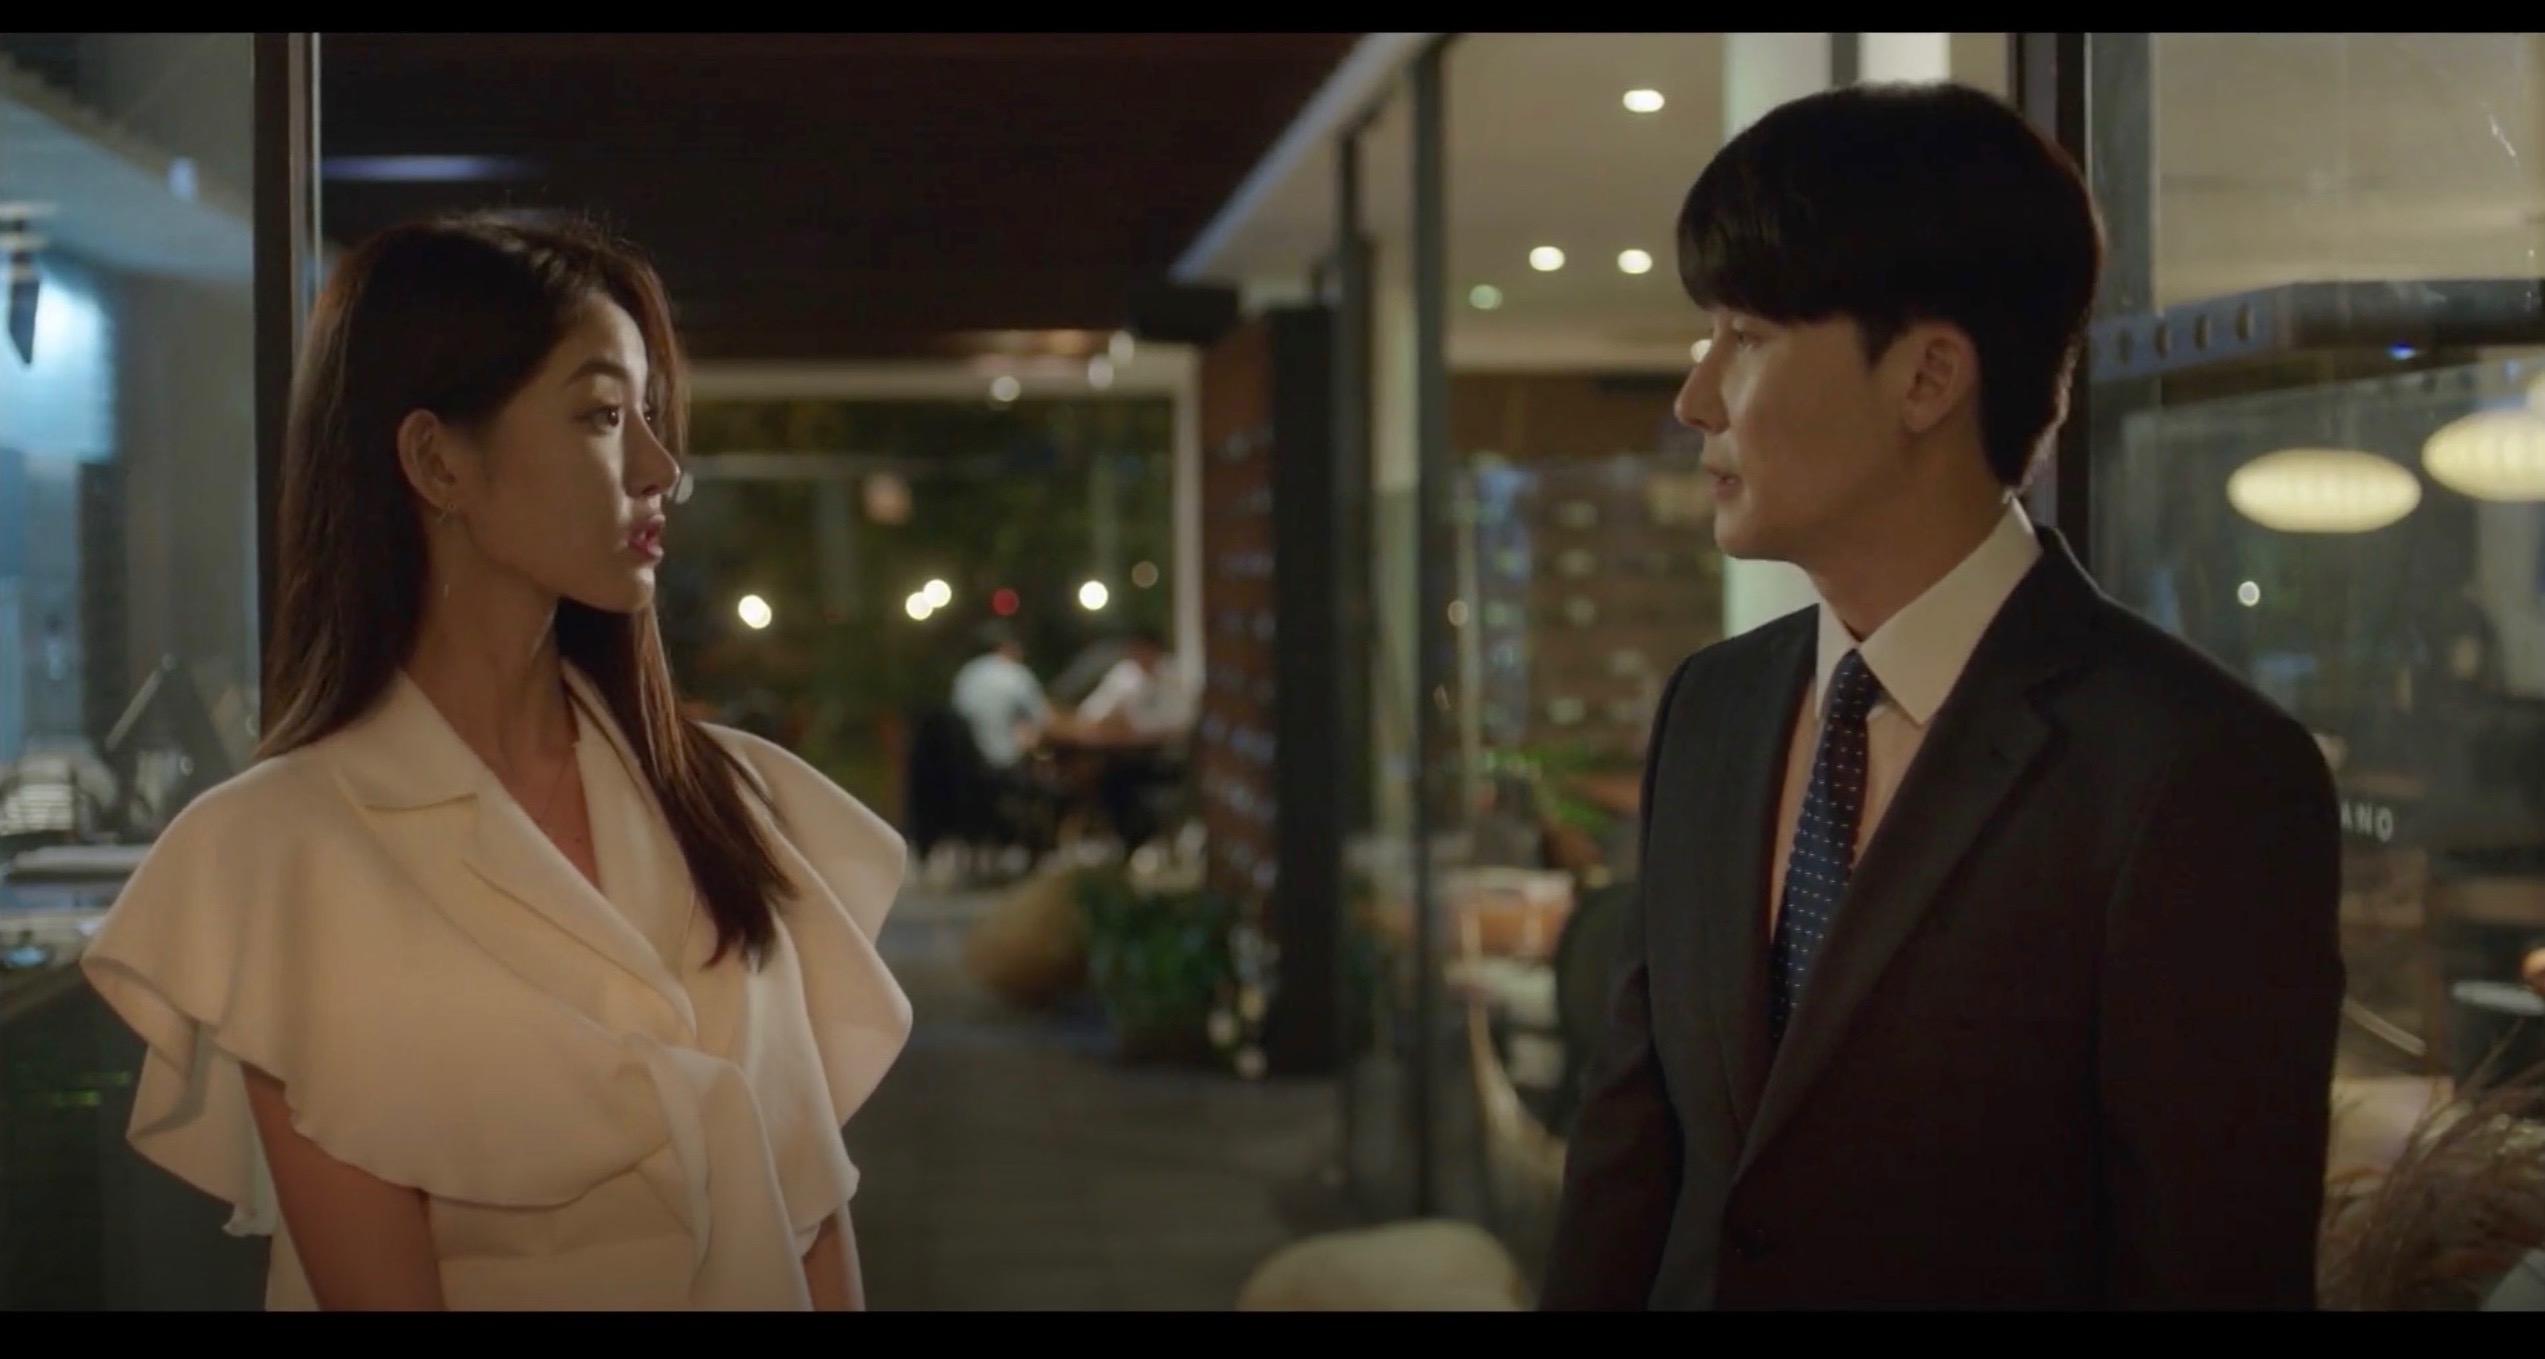 Pino Bistro Italiano [피노 이탈리안 레스토랑] – Korean Dramaland